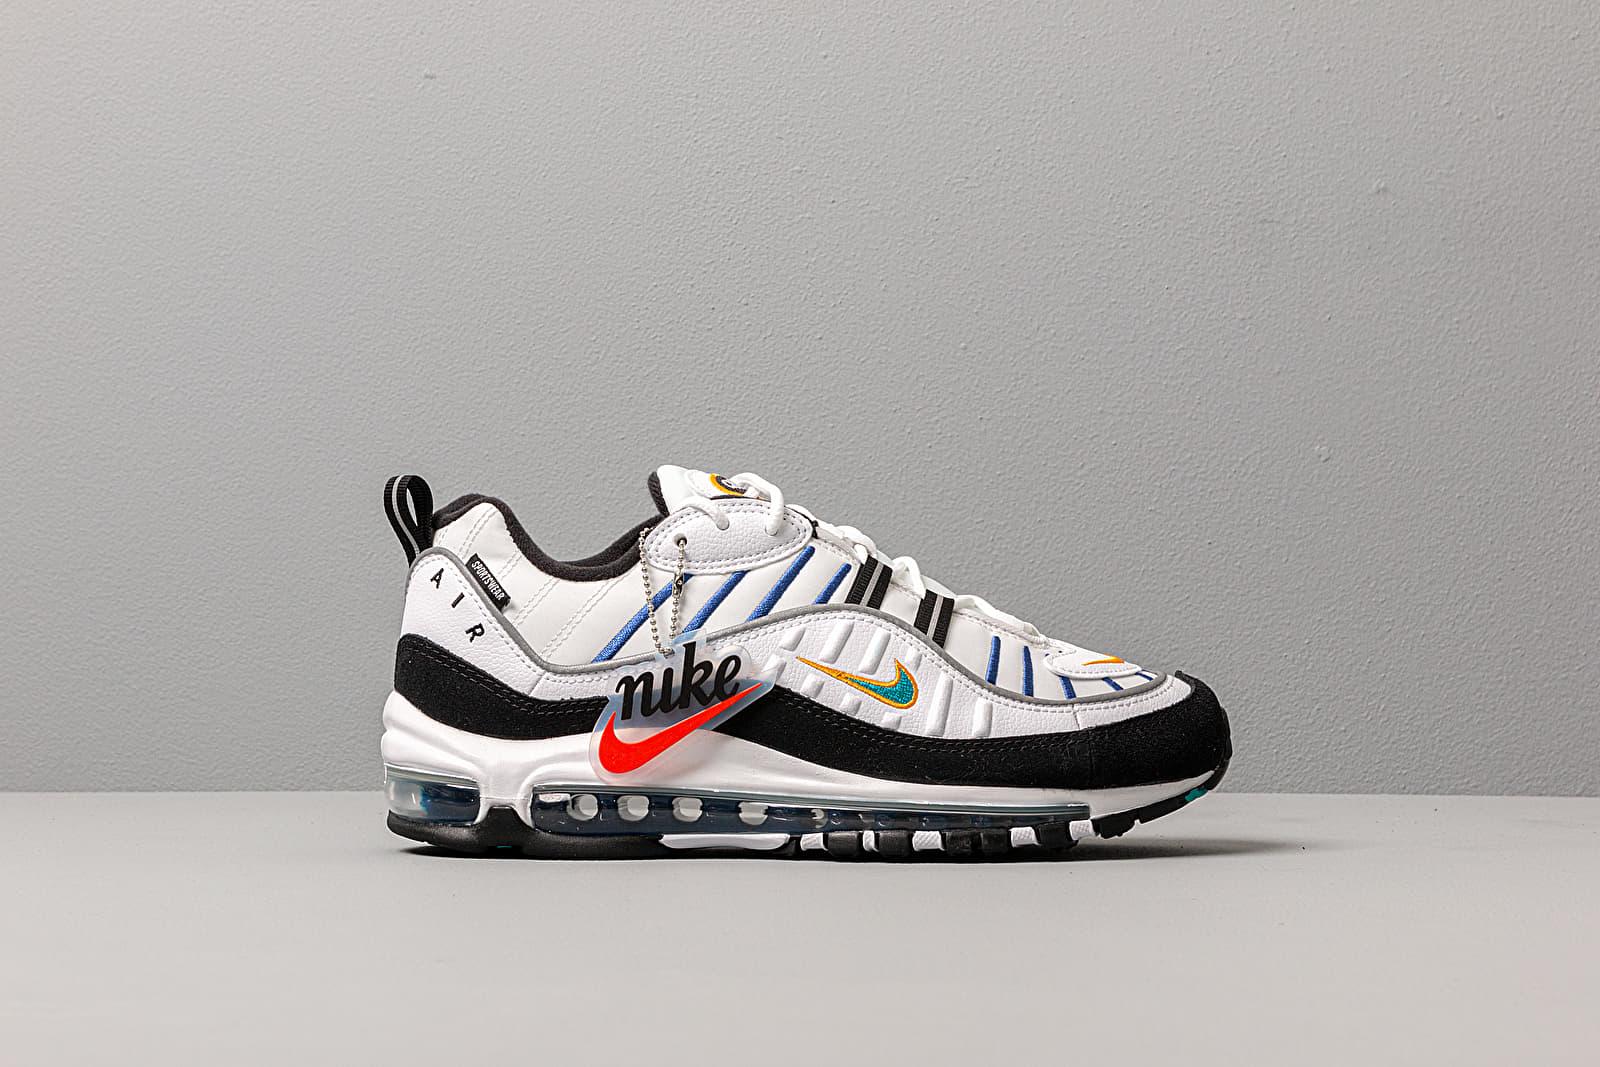 Women S Shoes Nike Wmns Air Max 98 Premium White Teal Nebula